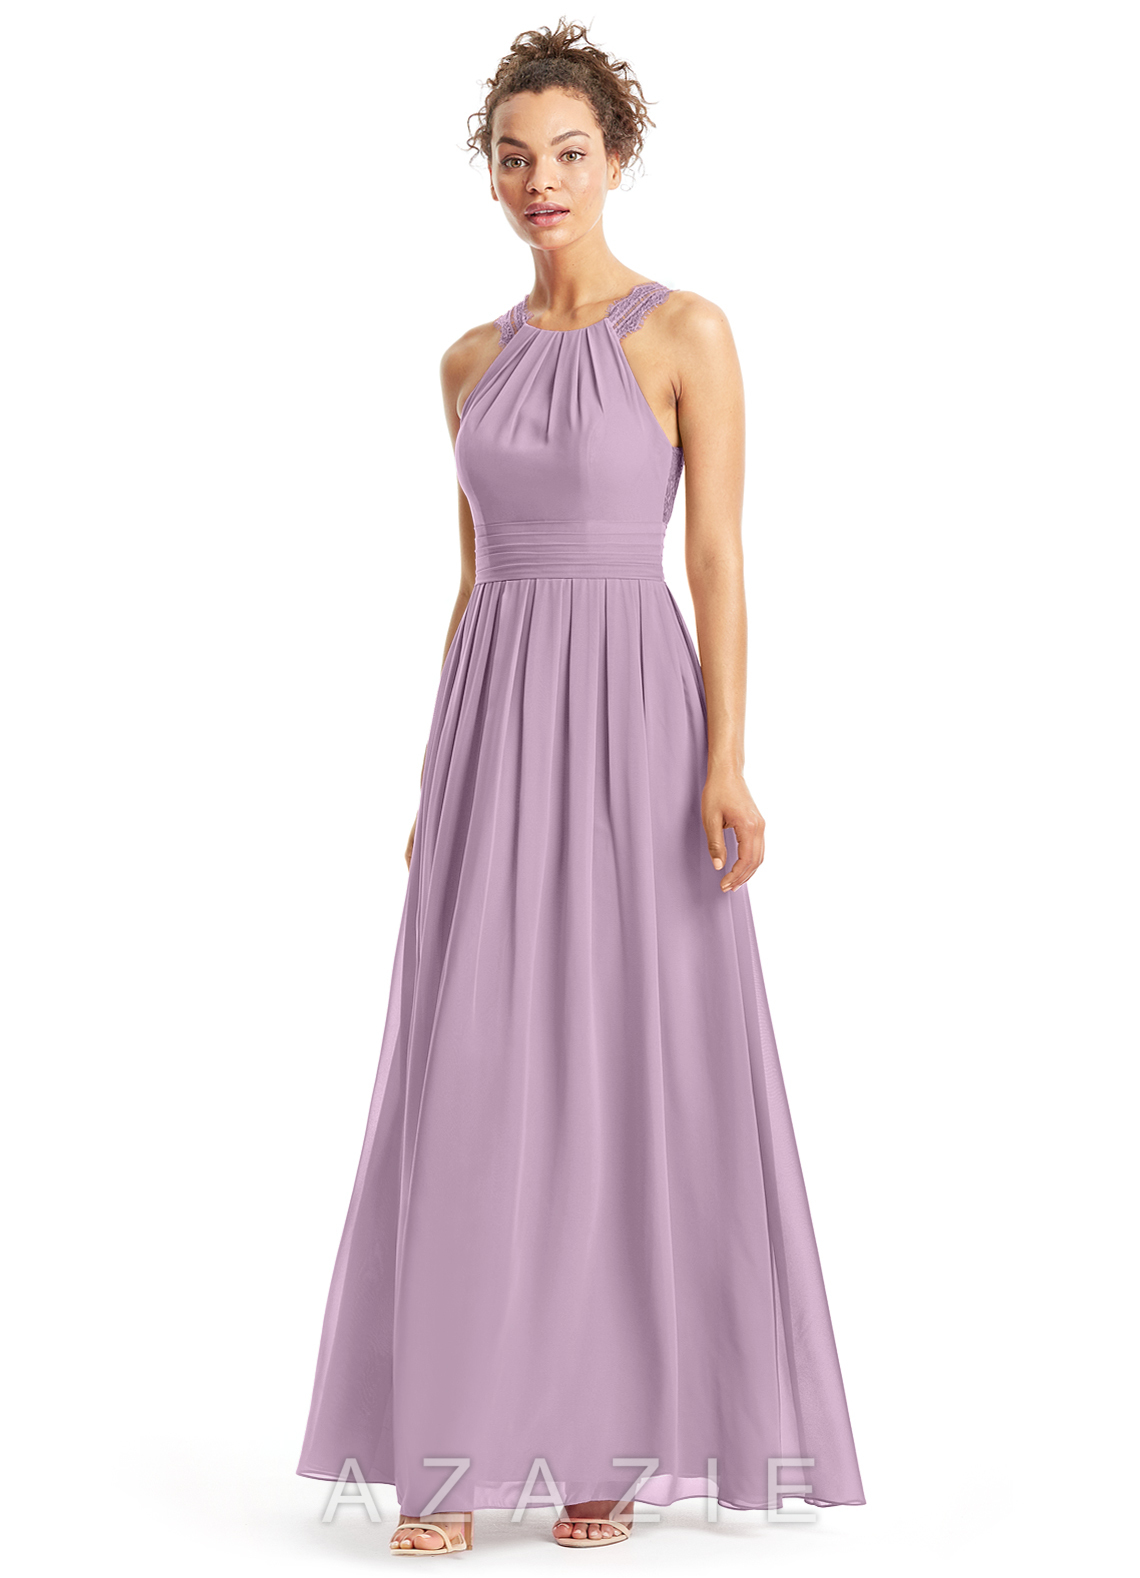 2f8c4b3cb270bf Azazie Colleen Bridesmaid Dress